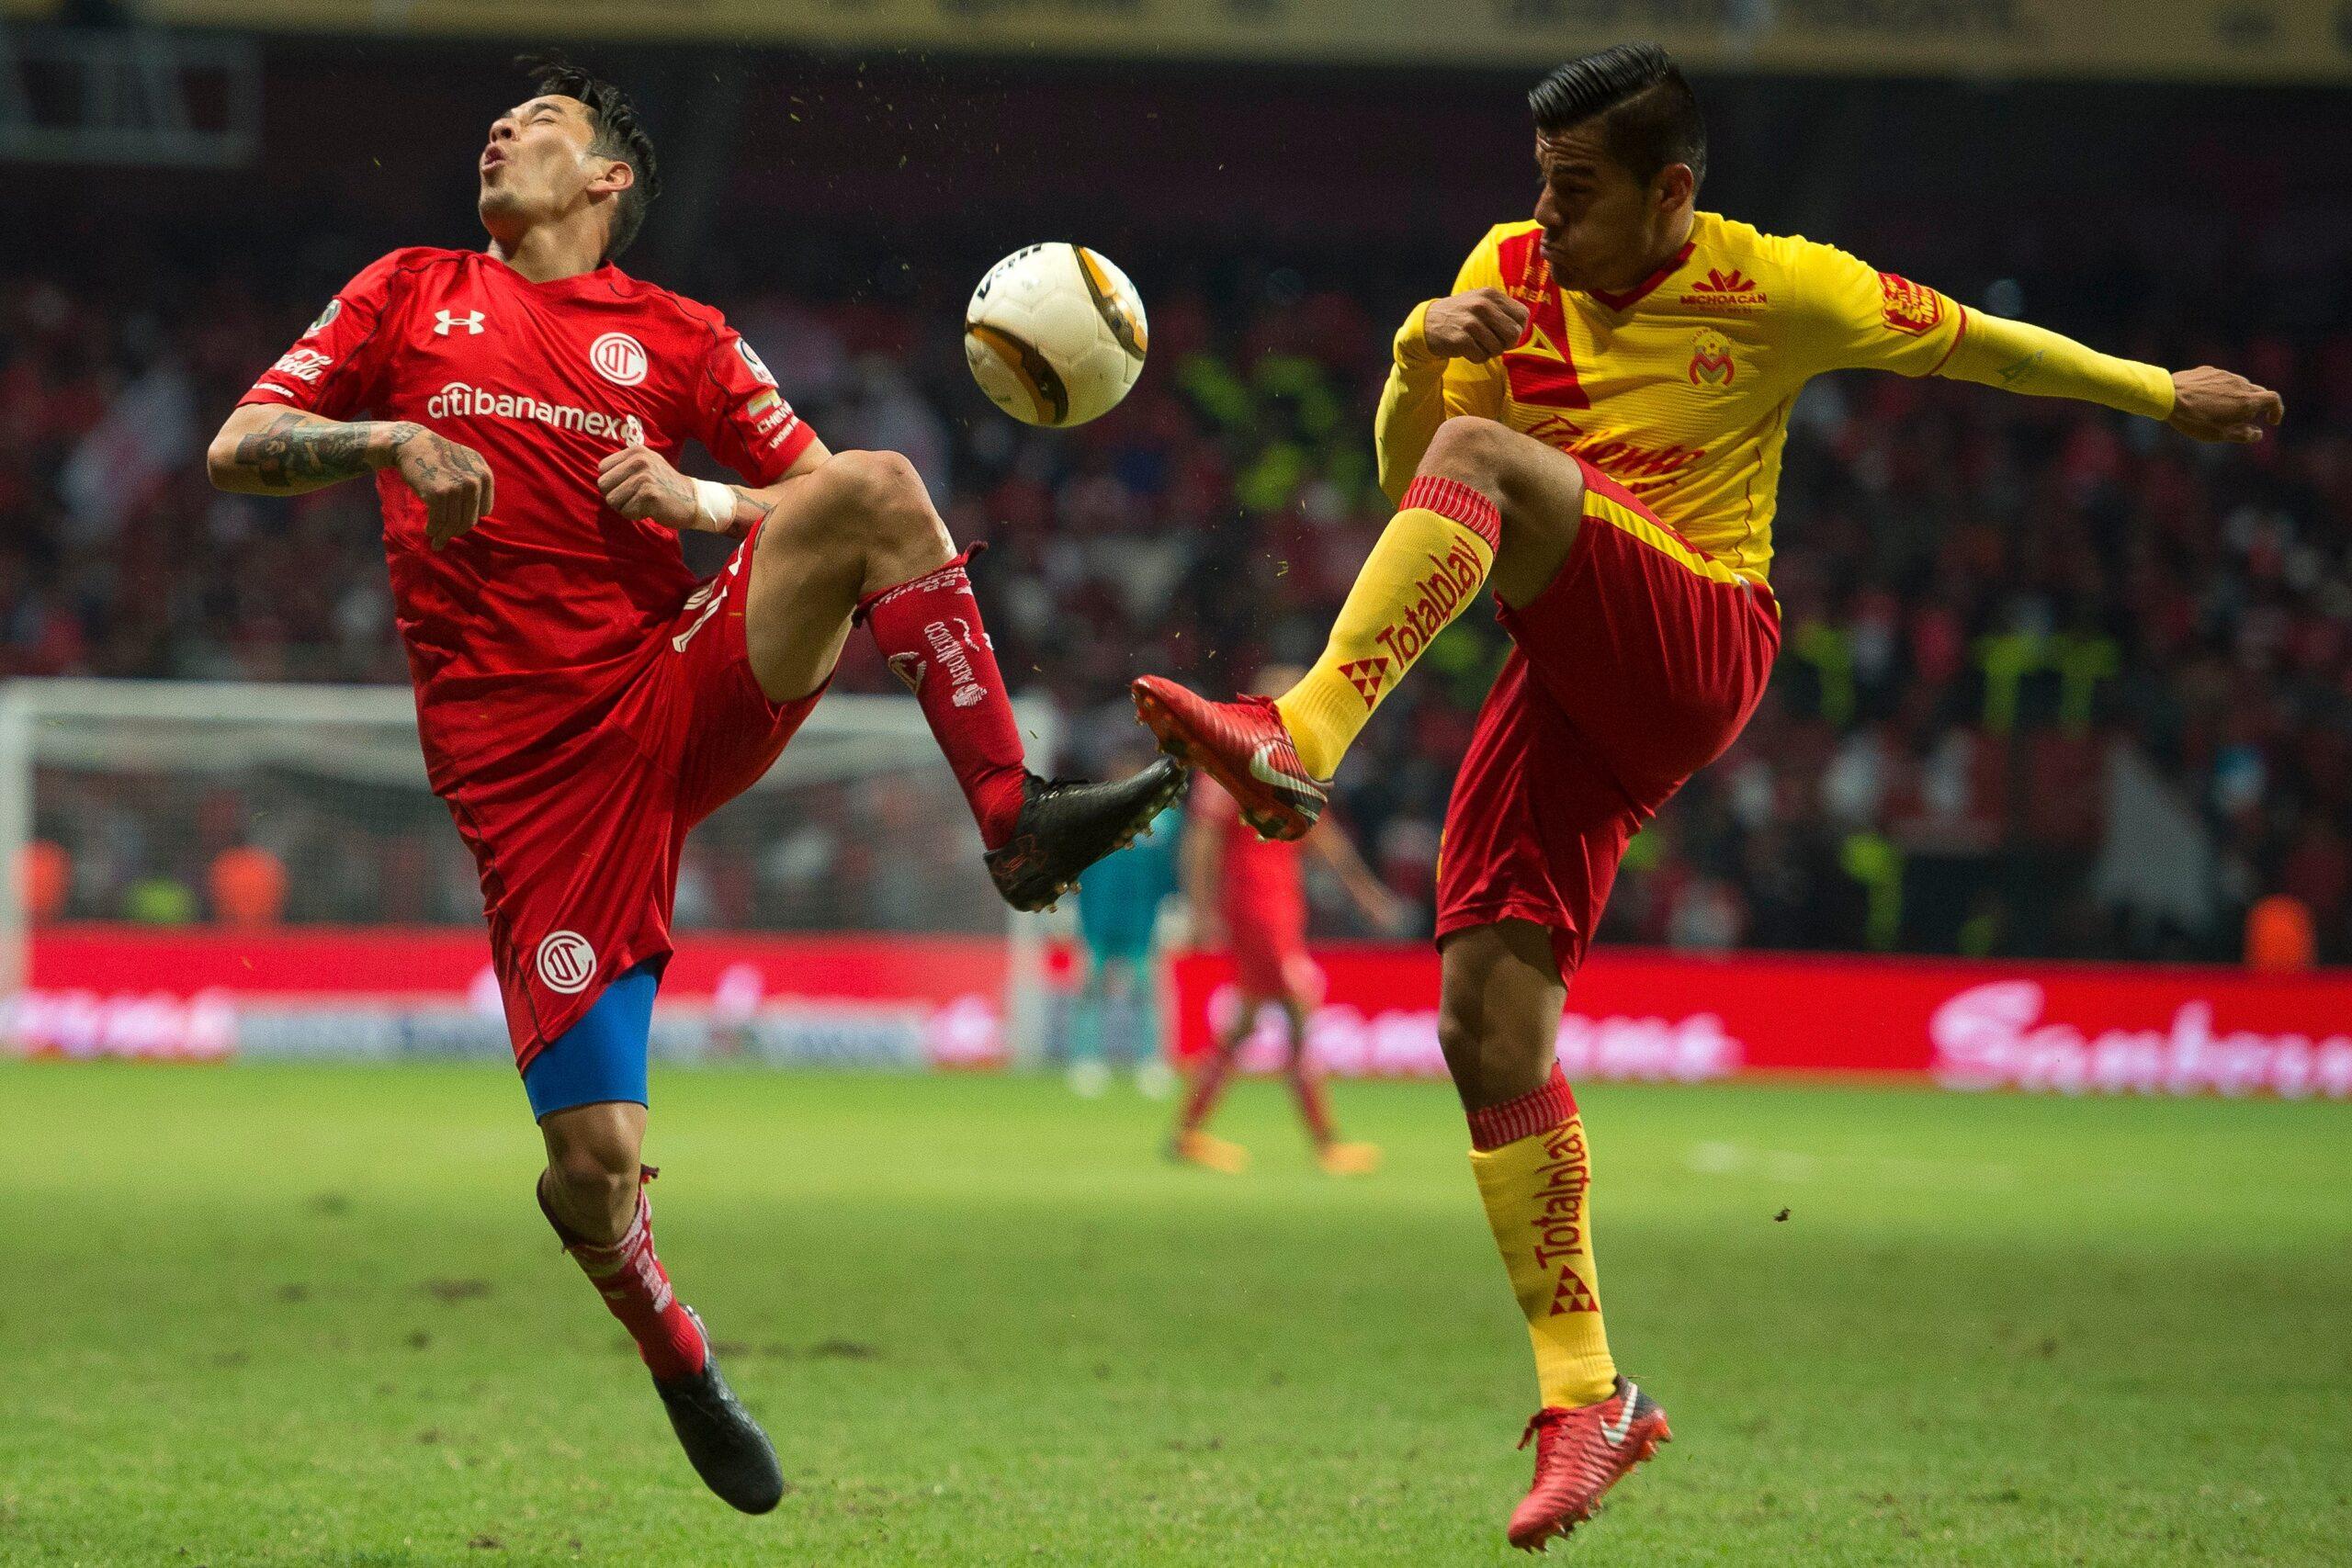 Liga MX: Ver en vivo Monarcas vs Veracruz en la Jornada 3 del Clausura 2019